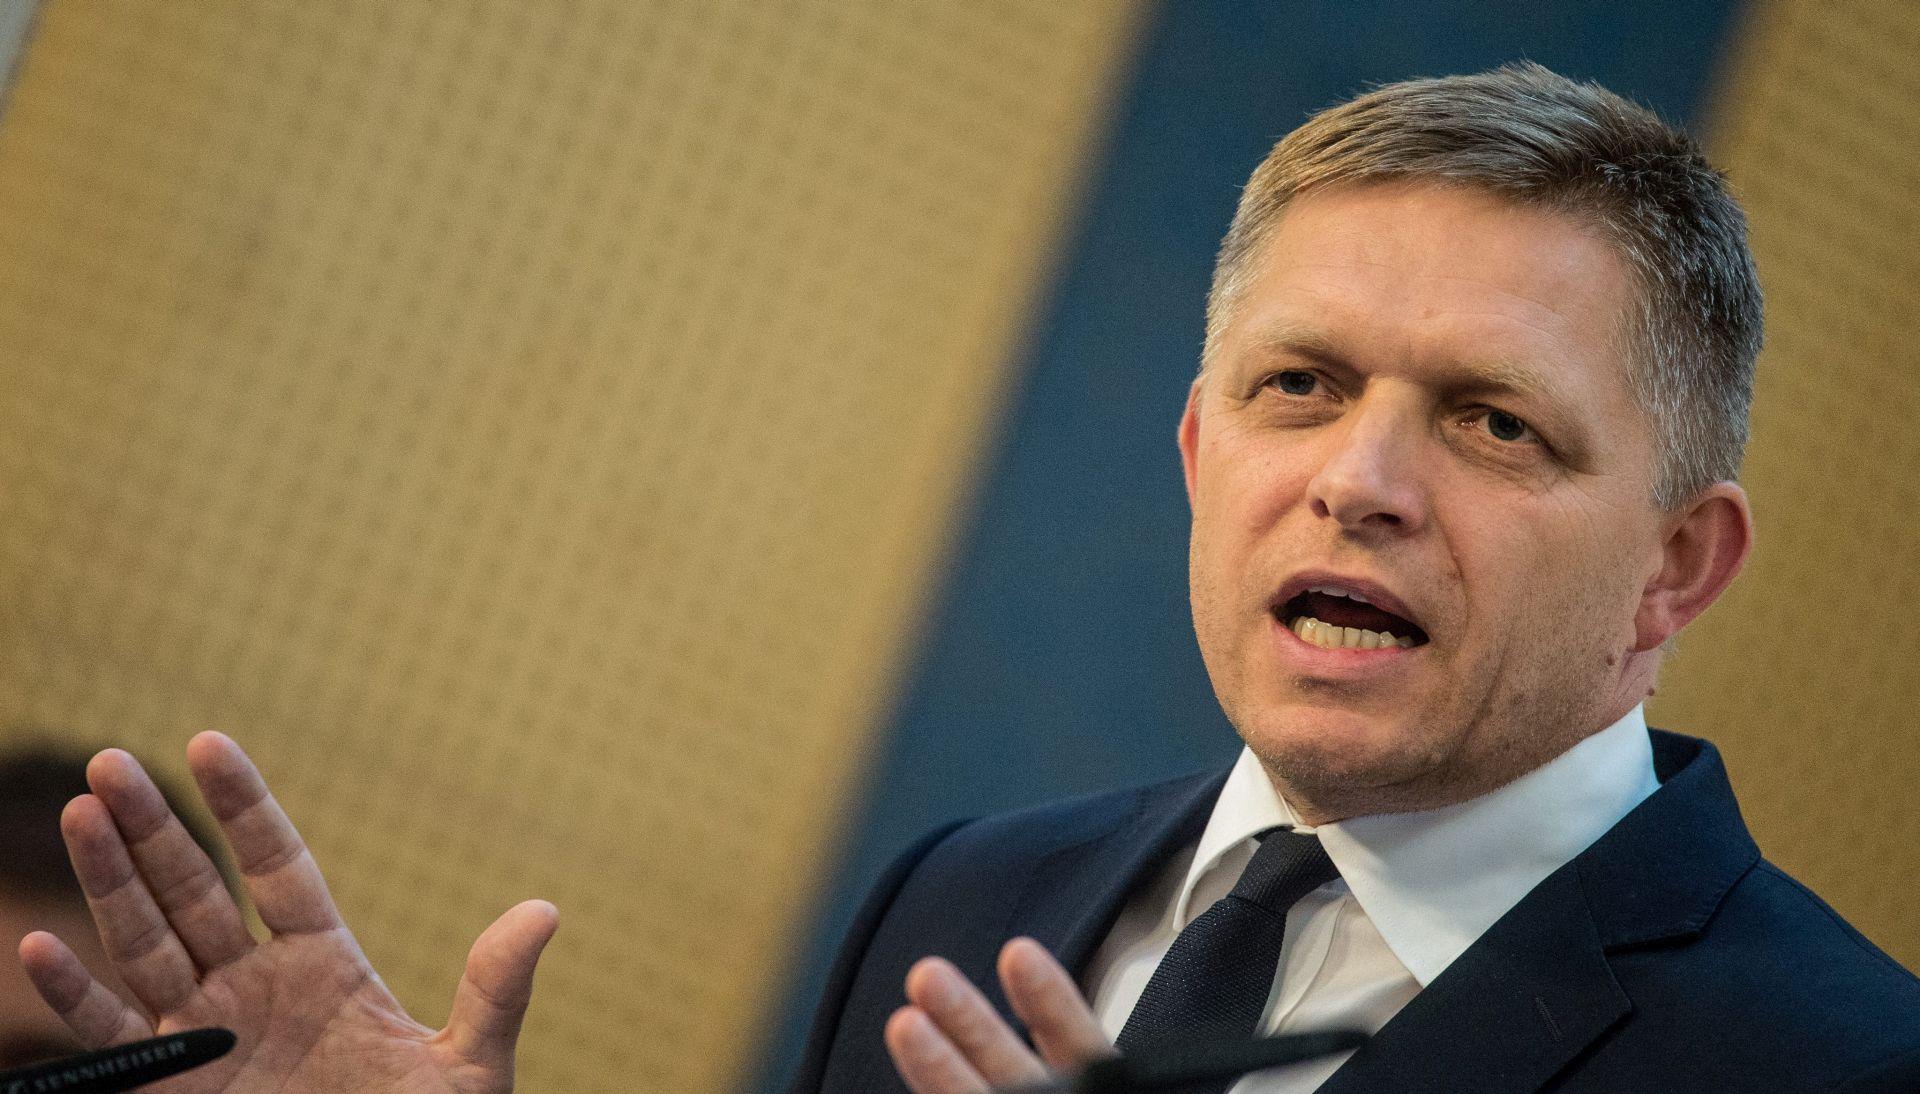 Slovački premijer Fico ponovno odbio kvote koje je predložila Europska komisija